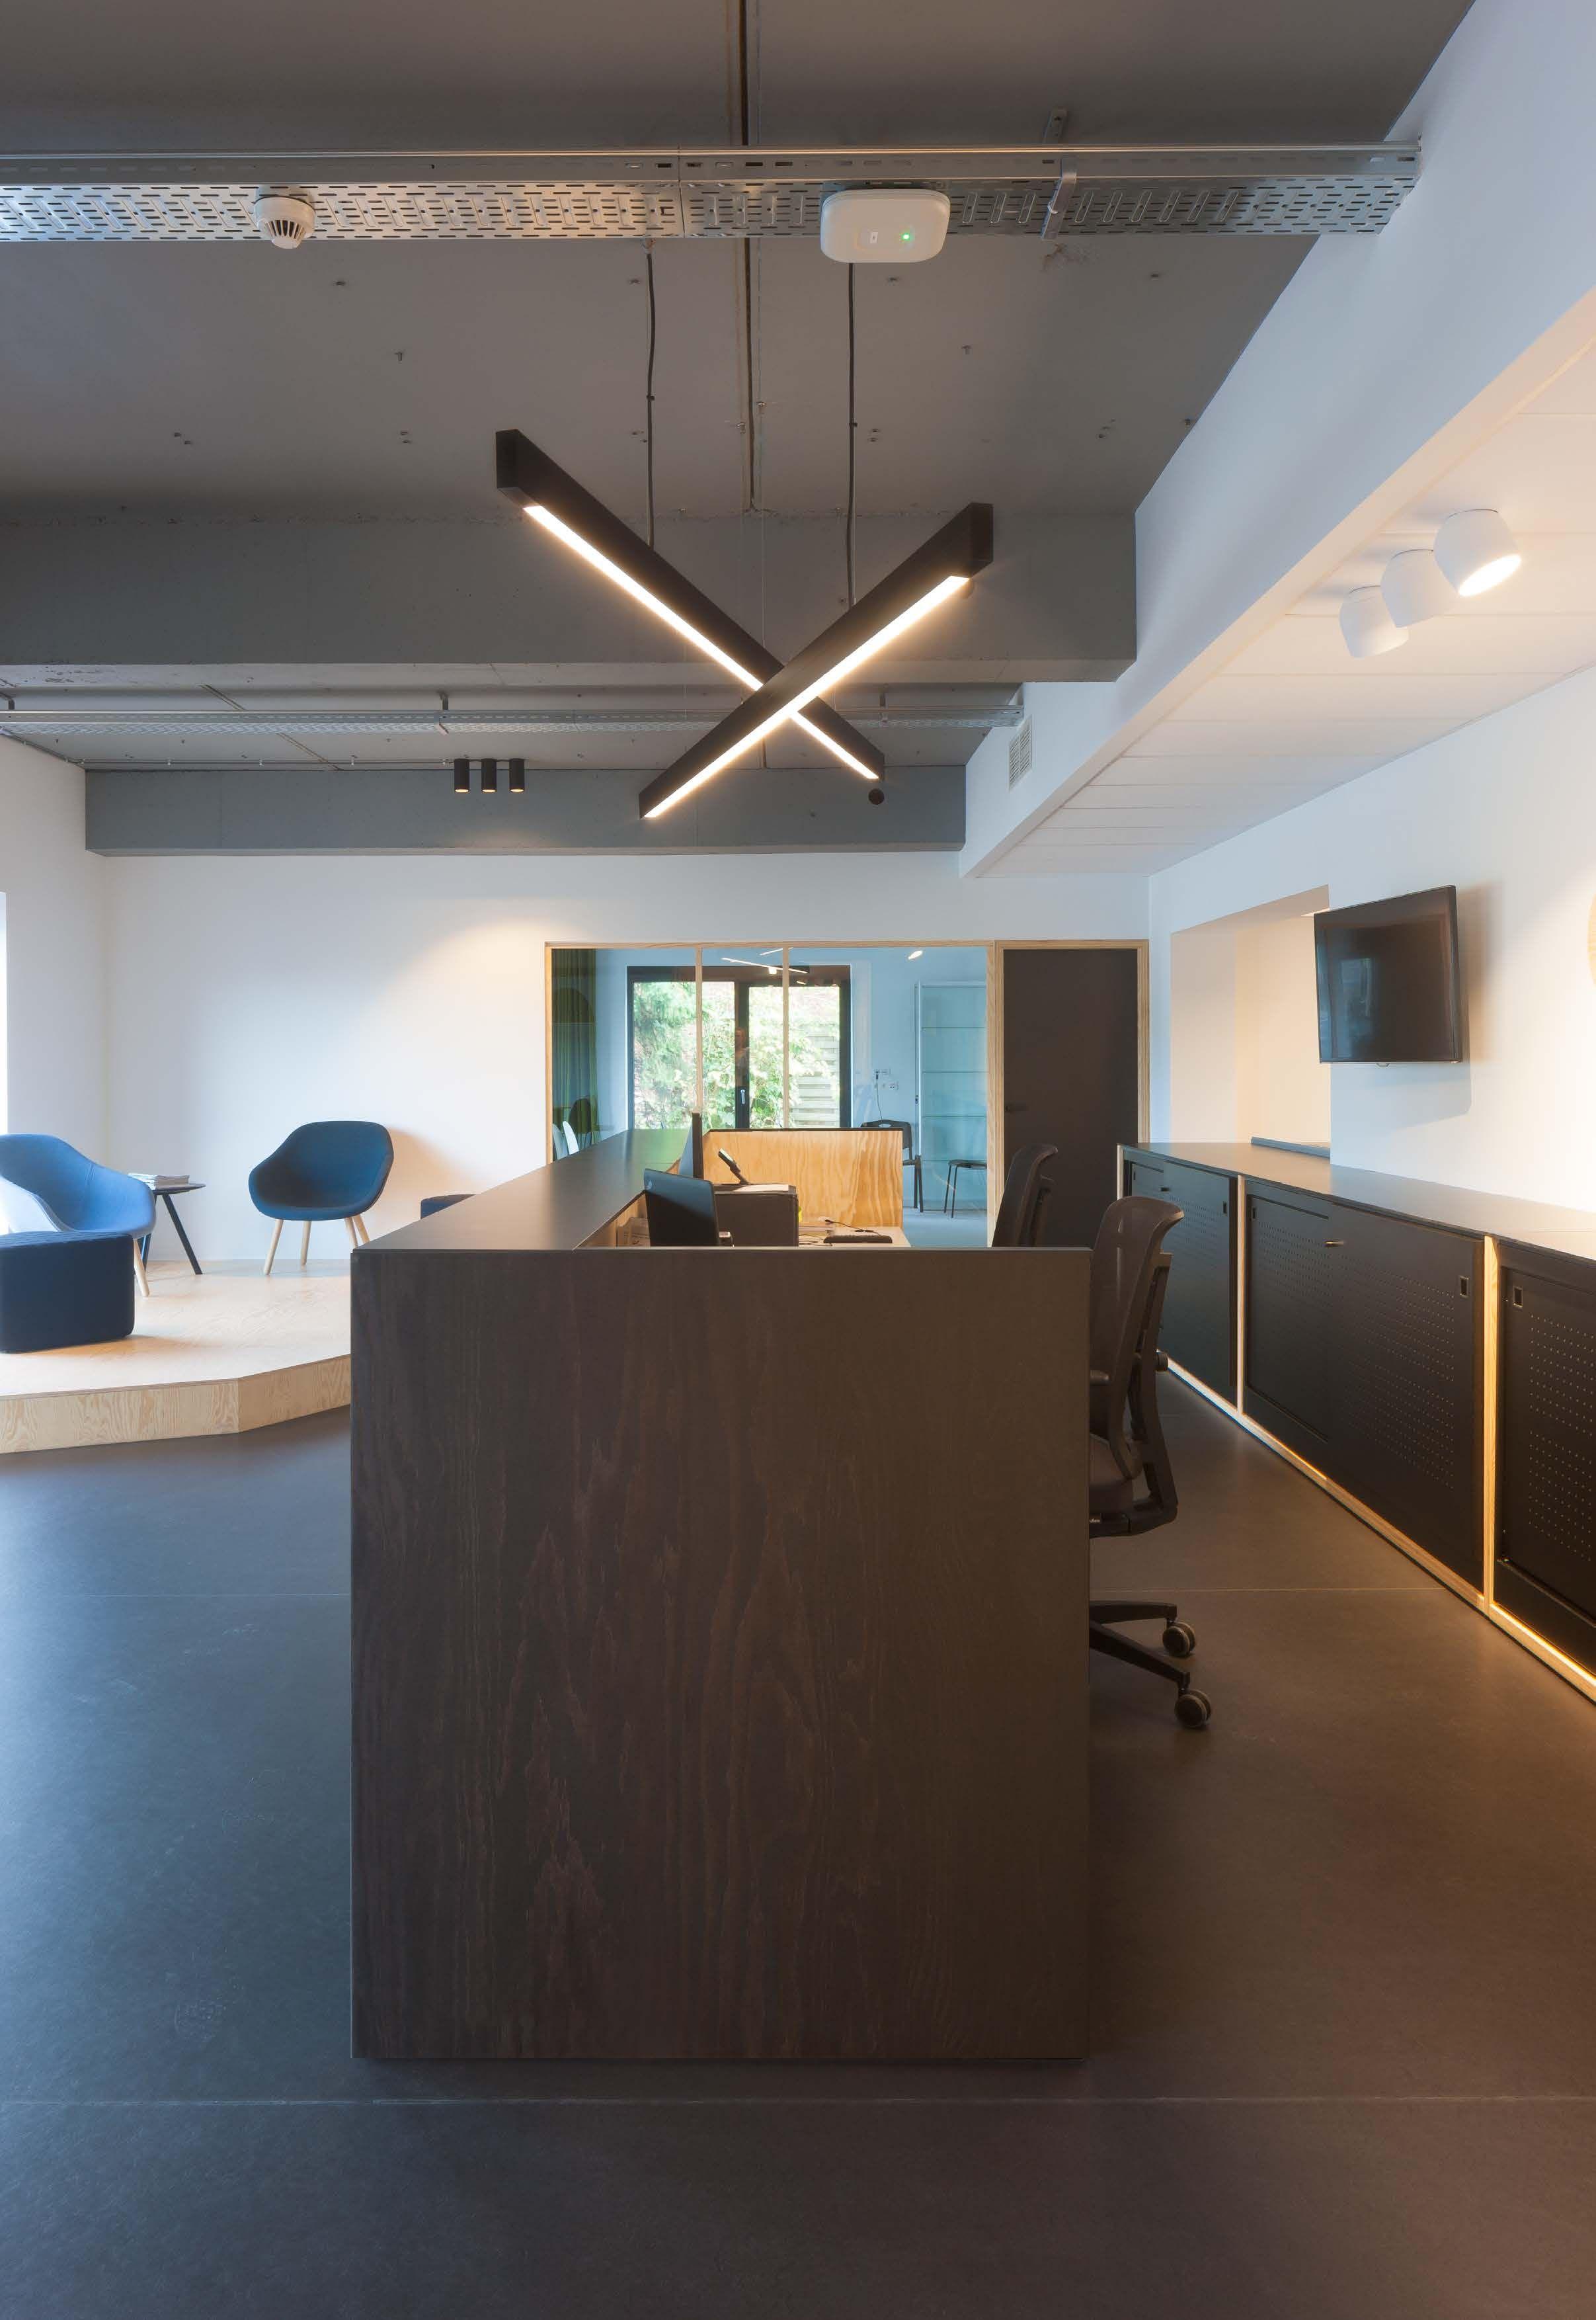 Snap Ceiling Suspension Lighting Solutions By Orbit Get